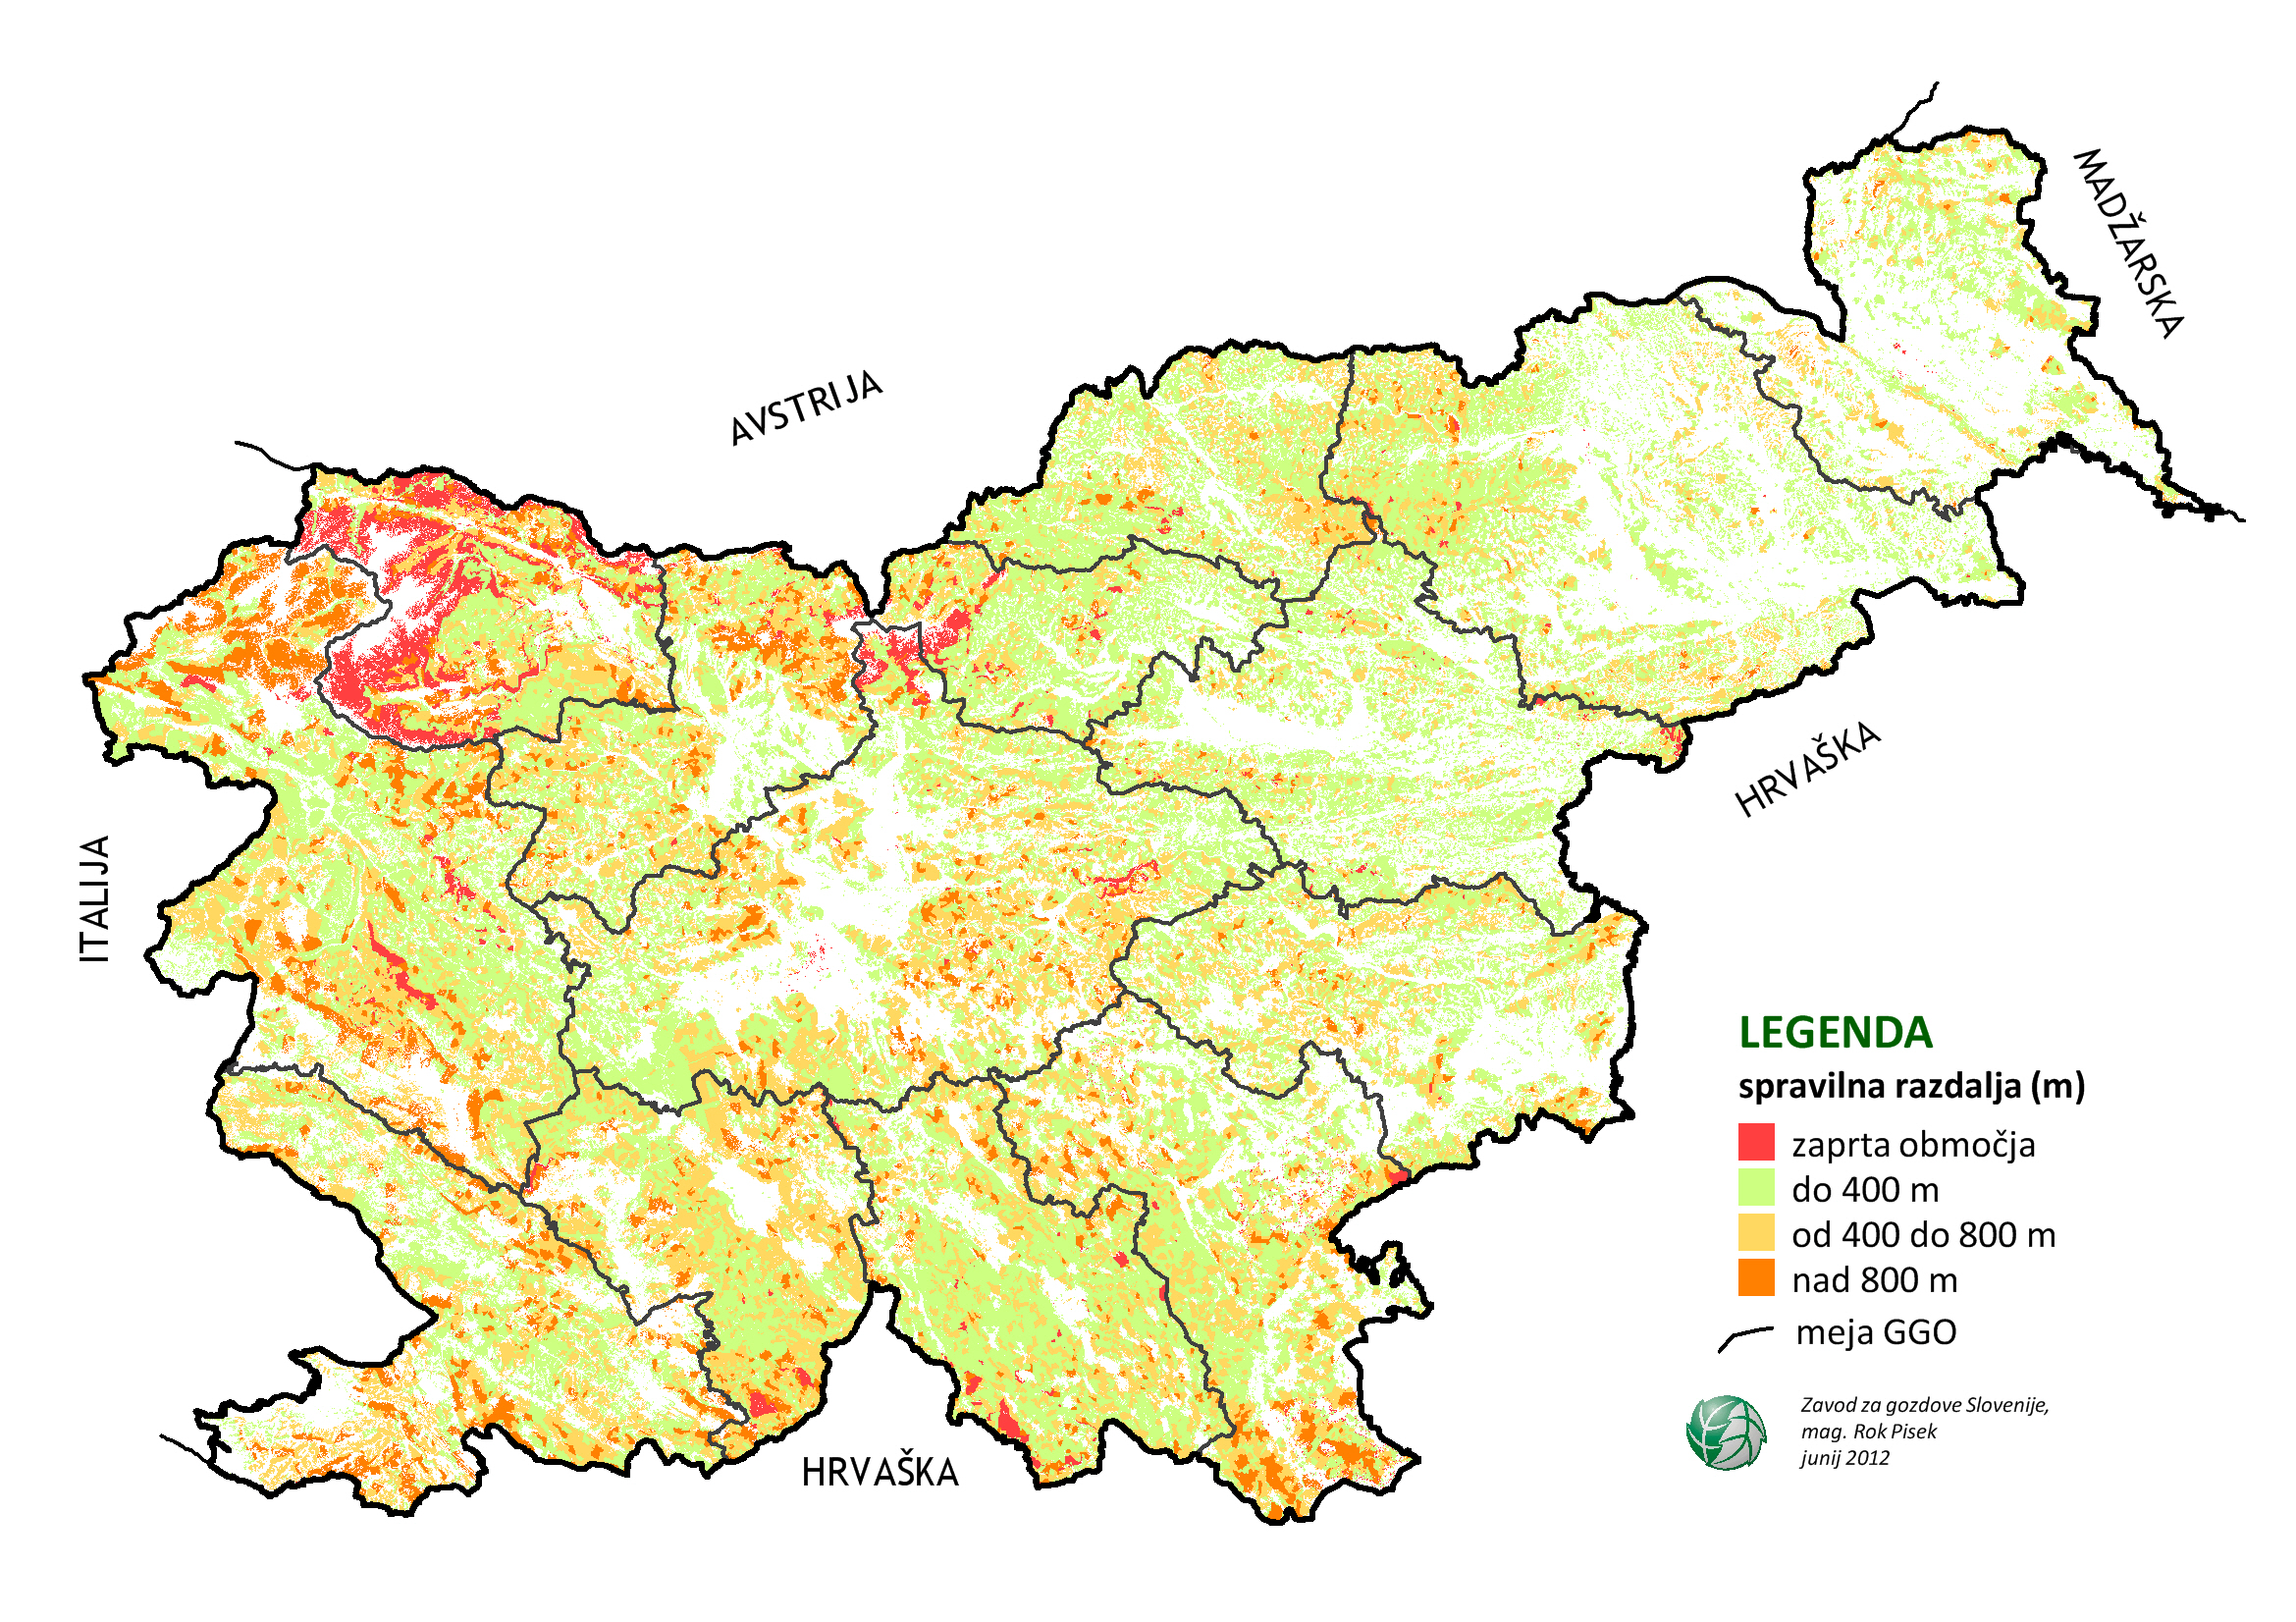 Slovenia Map And Slovenia Satellite Images